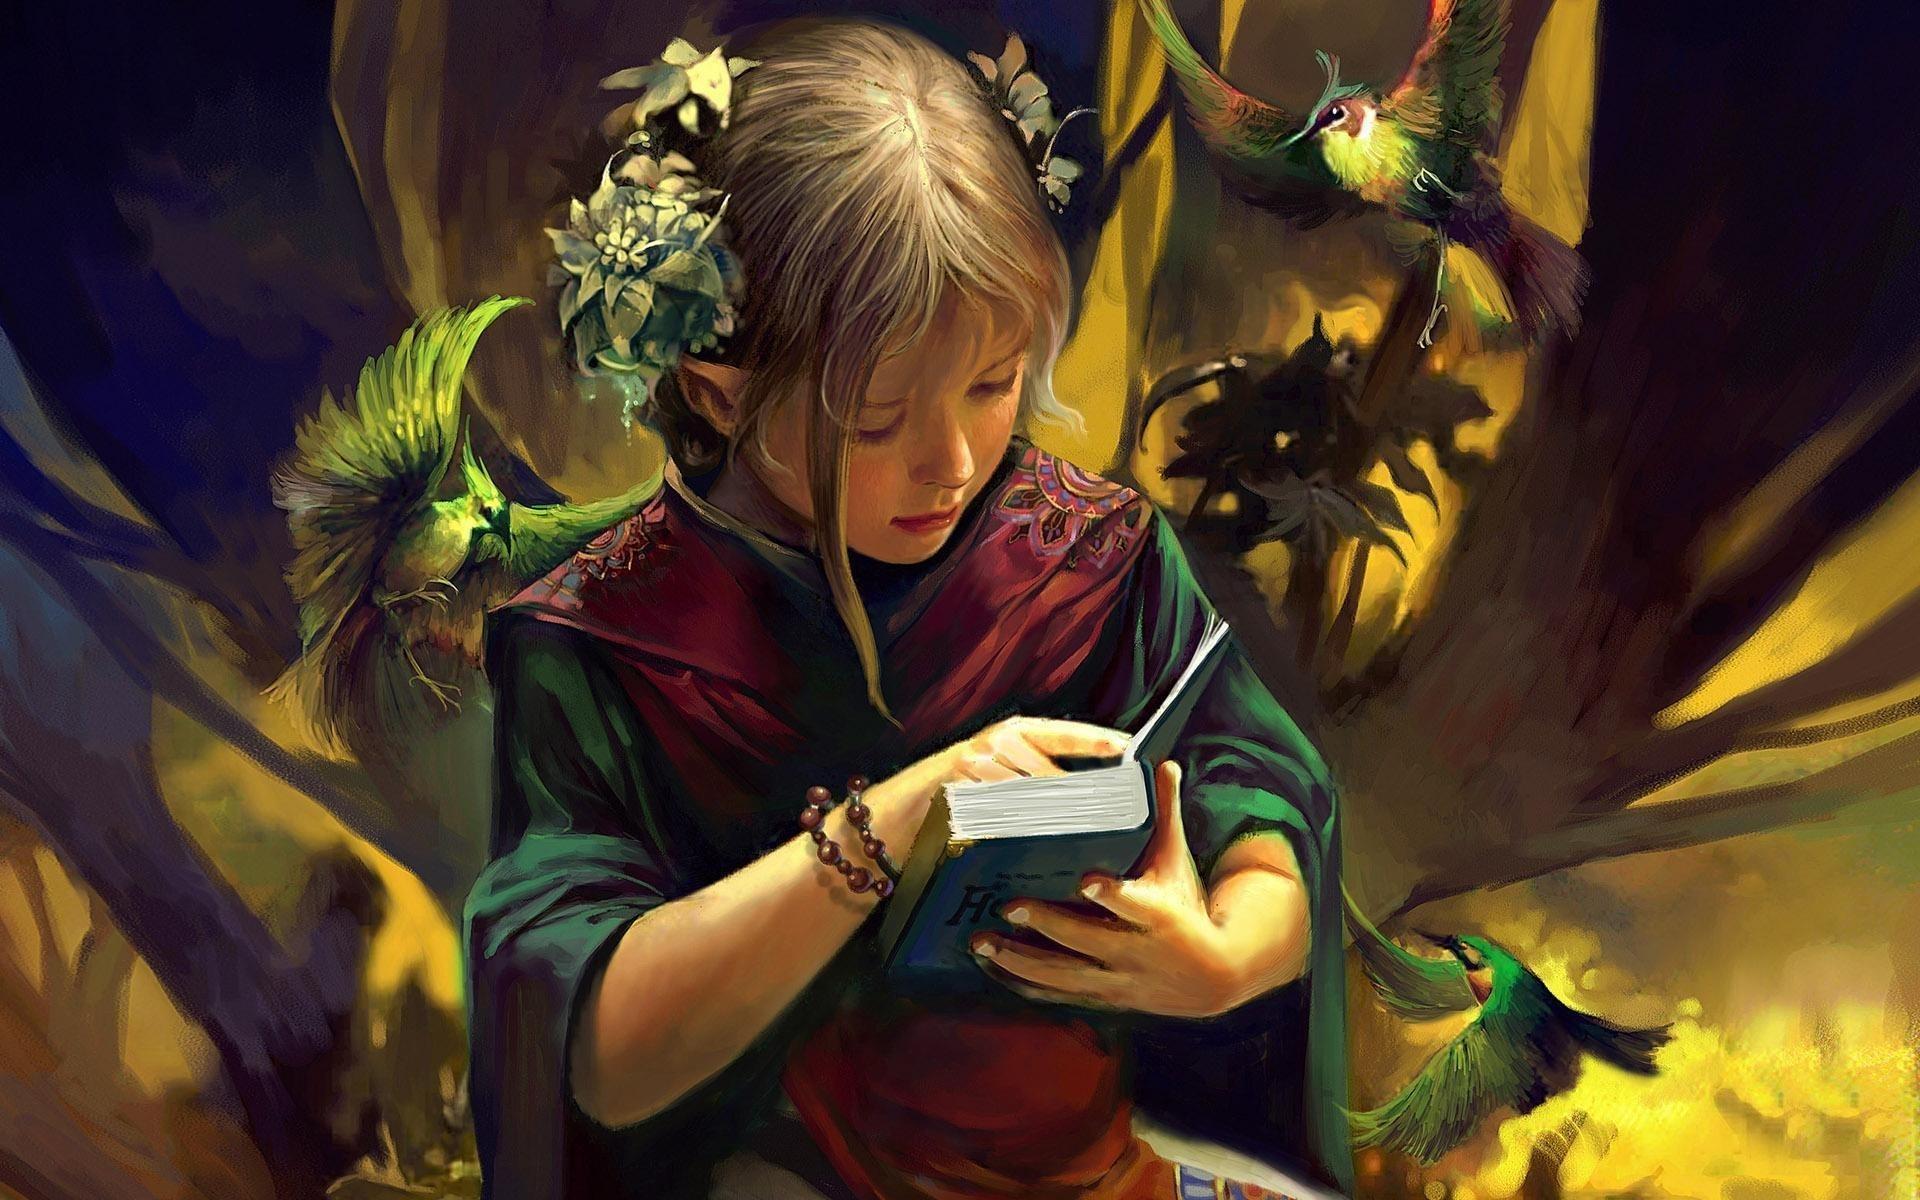 1920x1200 Girl Reading Book Fantasy Art 1200p Wallpaper Hd